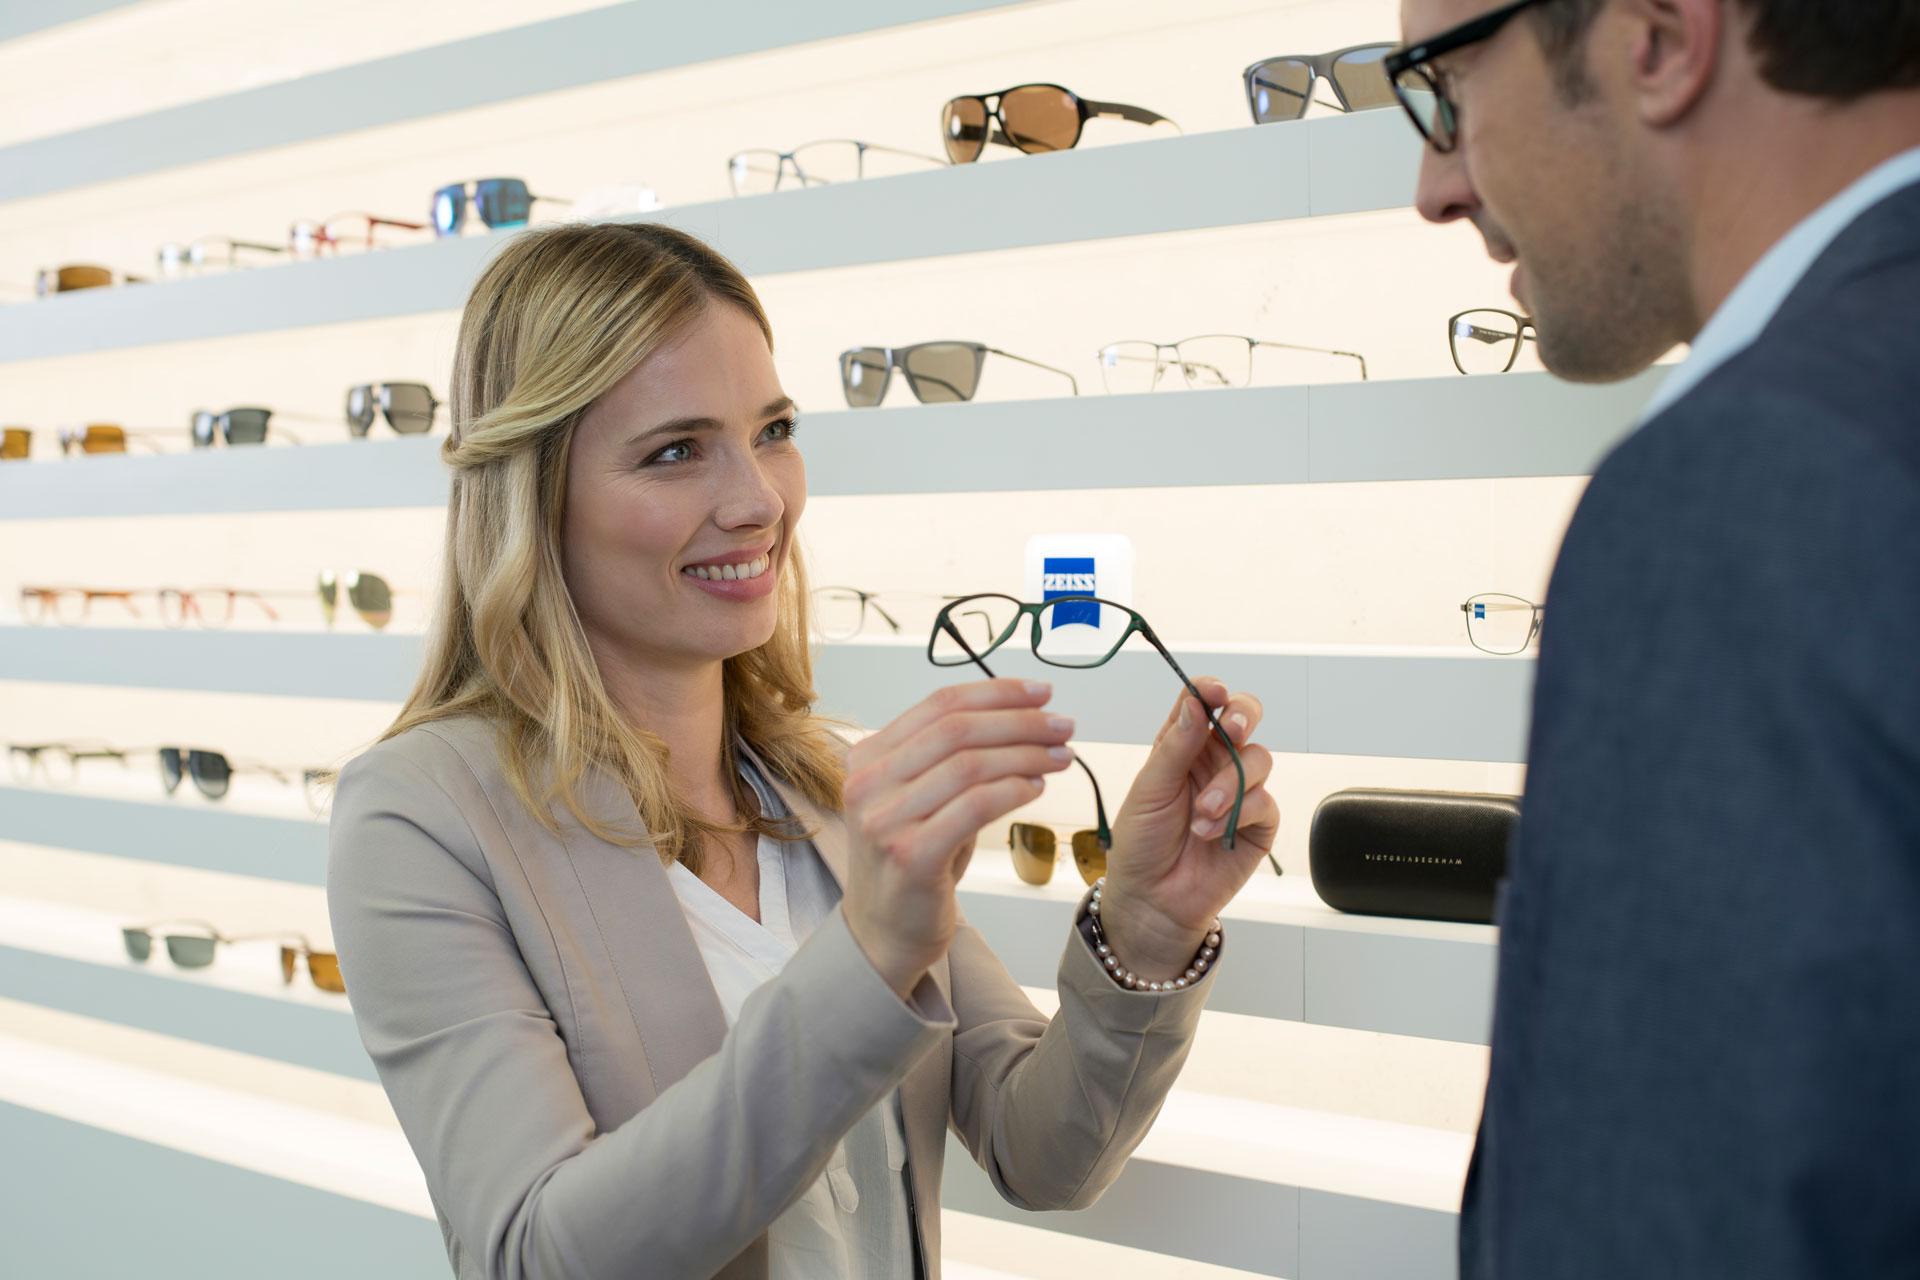 e121634f62a Buying eyeglasses  A checklist for buying new eyeglasses